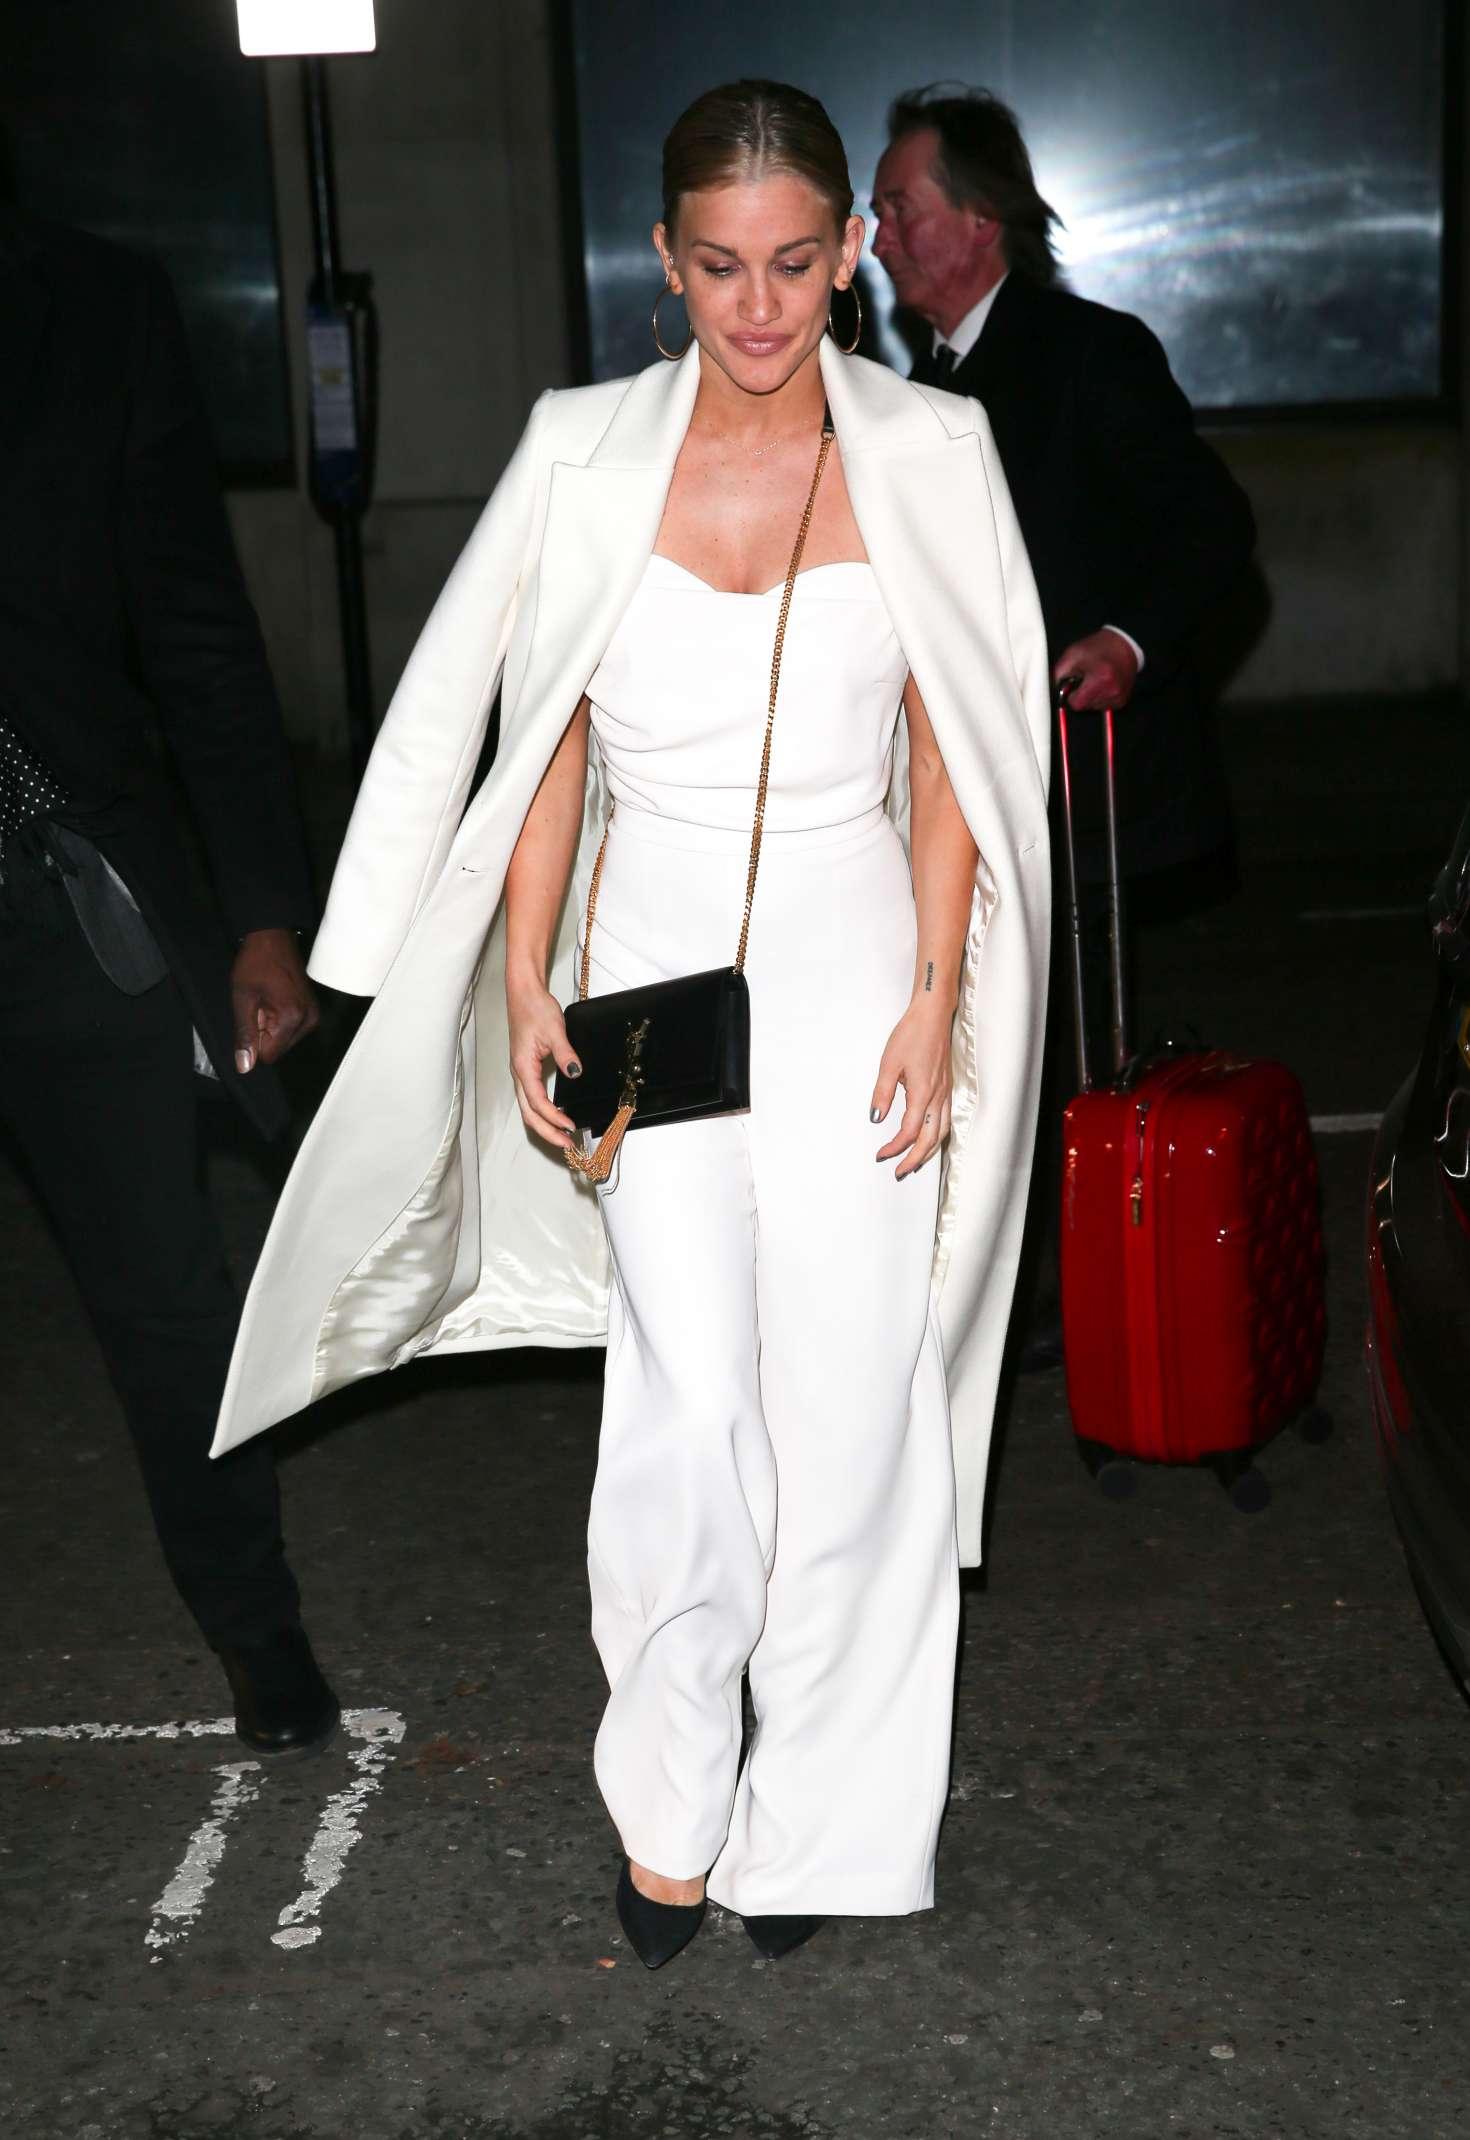 Ashley Roberts 2018 : Ashley Roberts: Arriving on Chris Evans Breakfast Show -01